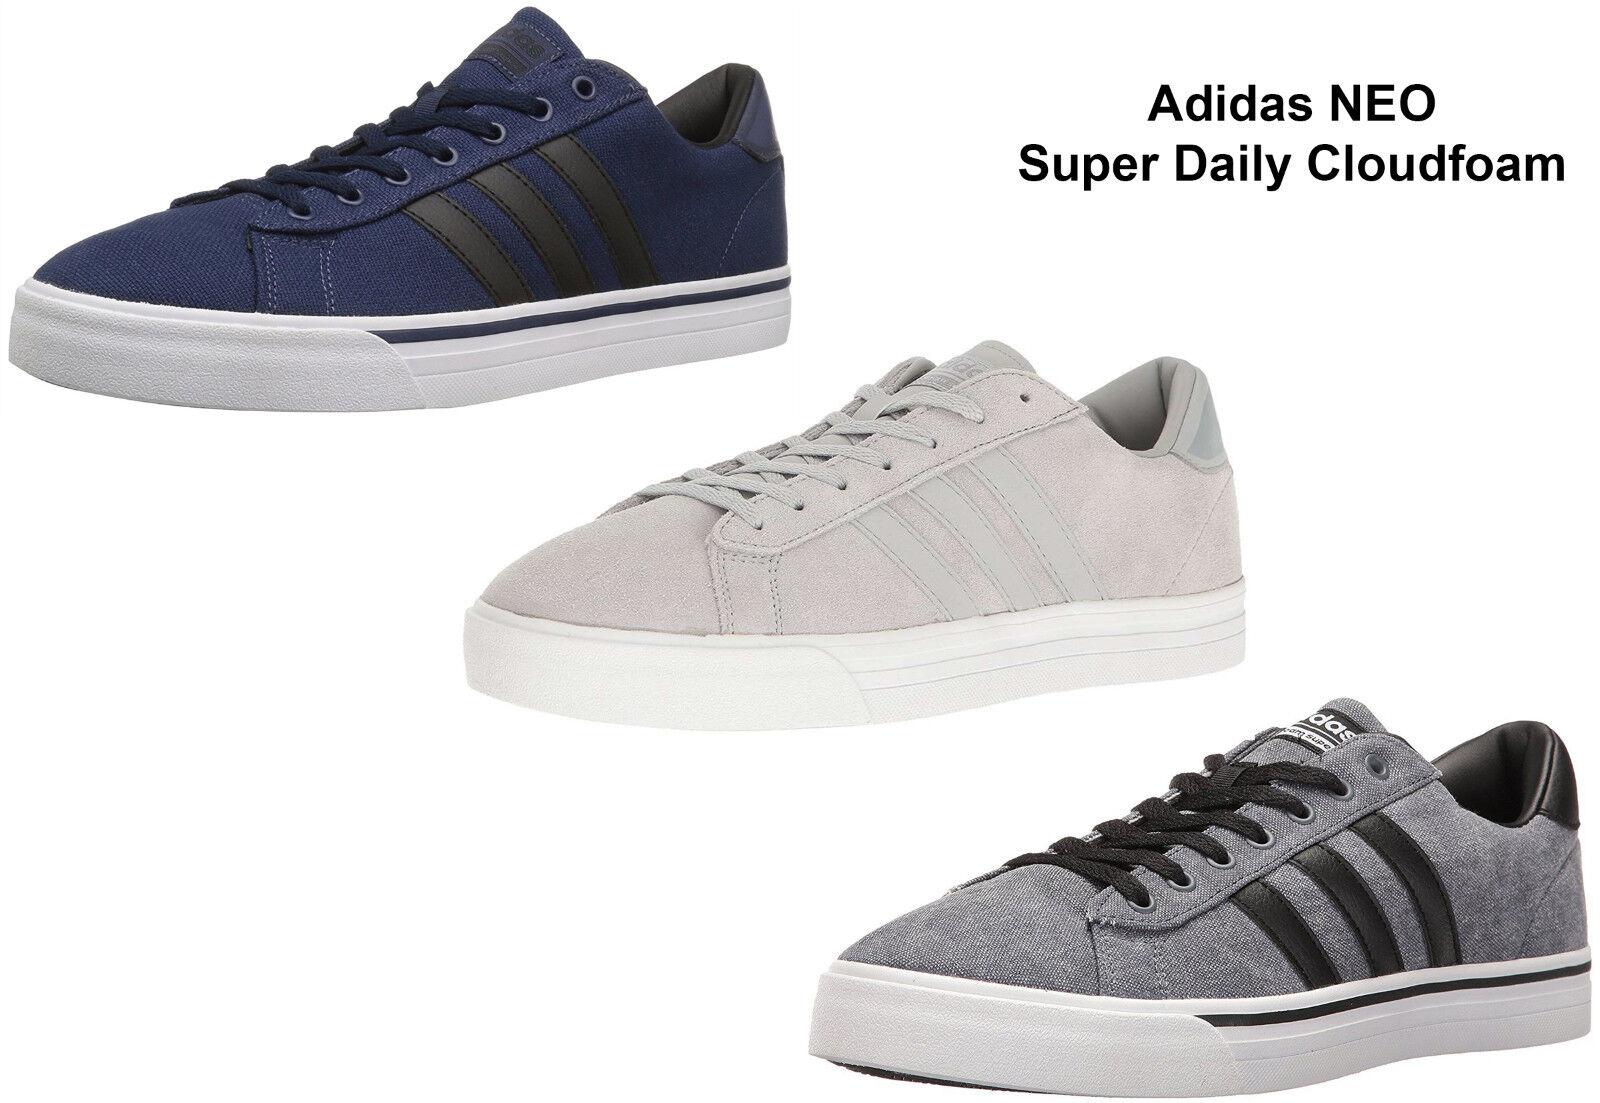 Adidas Neo Cloudfoam Super Napi Cipő Férfi Tenisz ÚJ